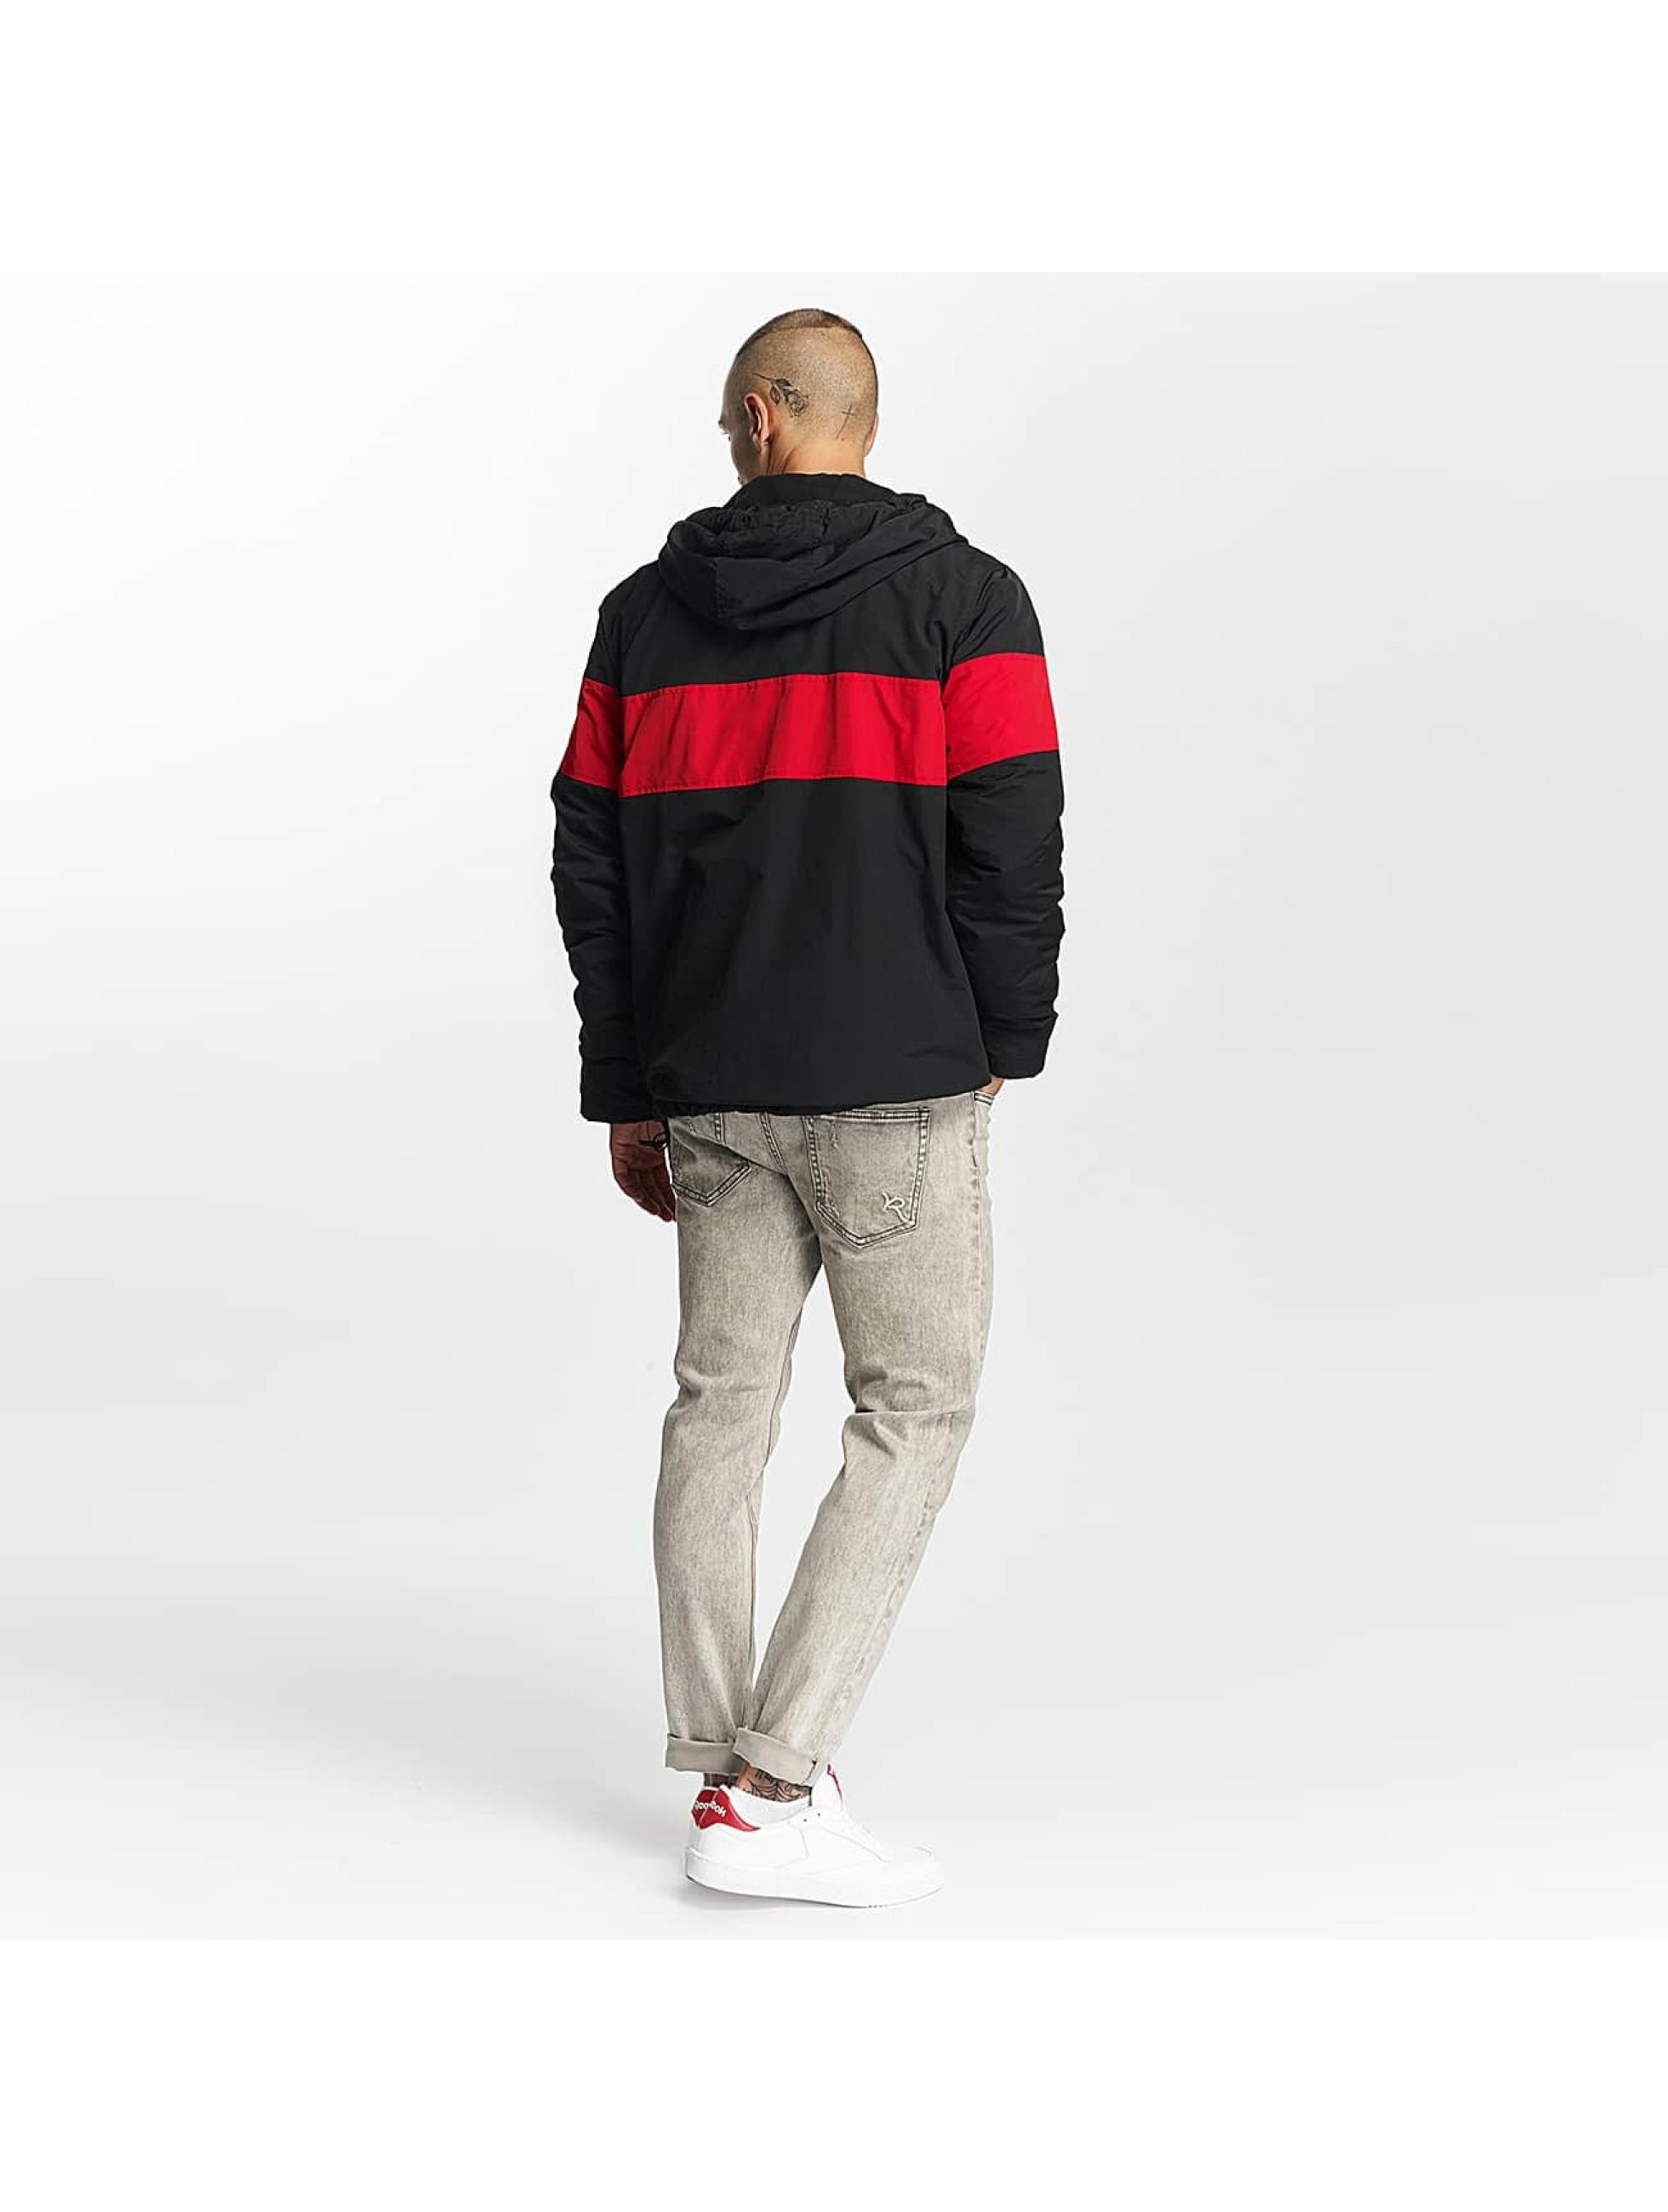 Pusher Apparel Transitional Jackets Ribbon svart